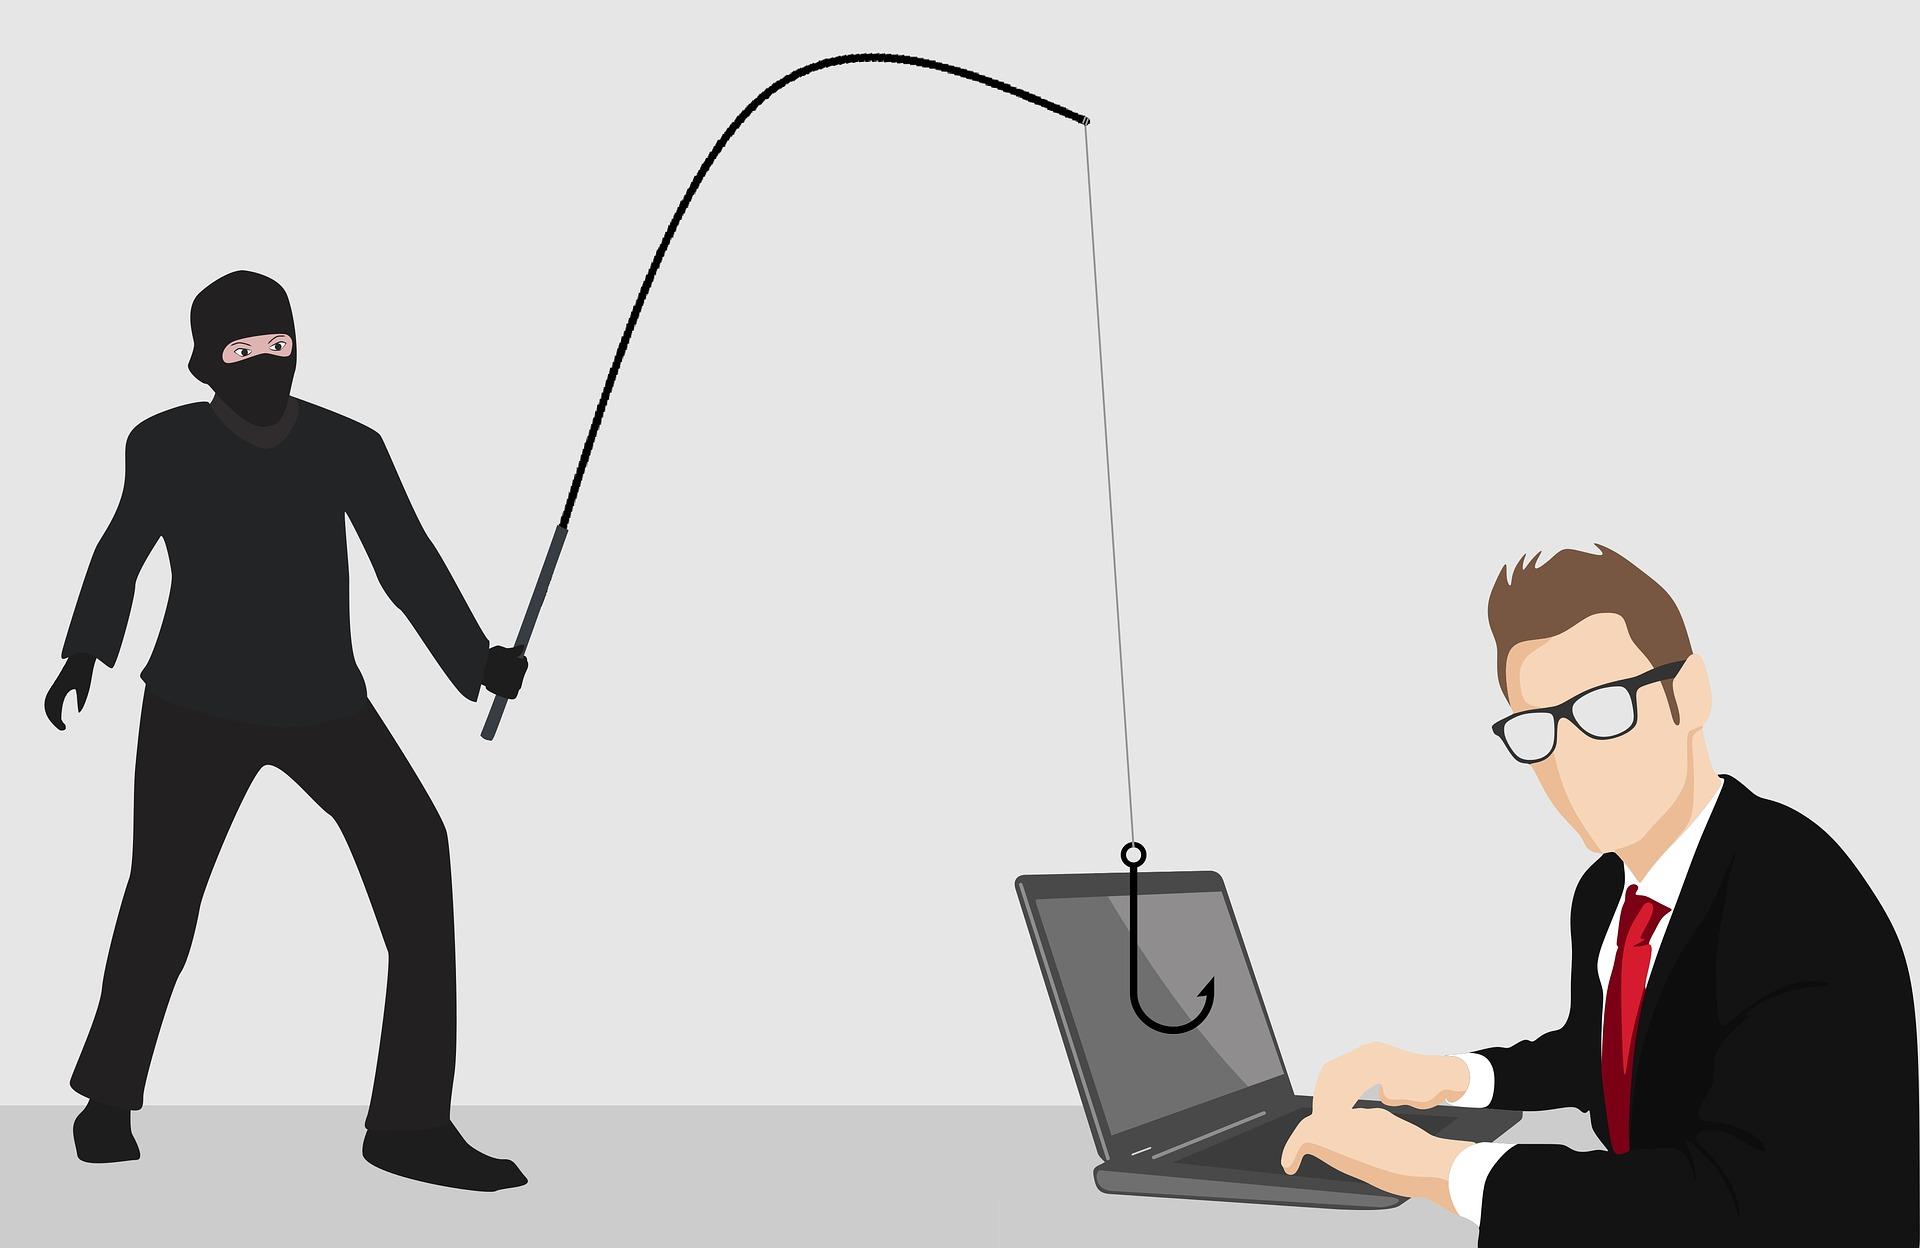 Re-Activation Υօսr BBT Coոtact Information Phishing Scams